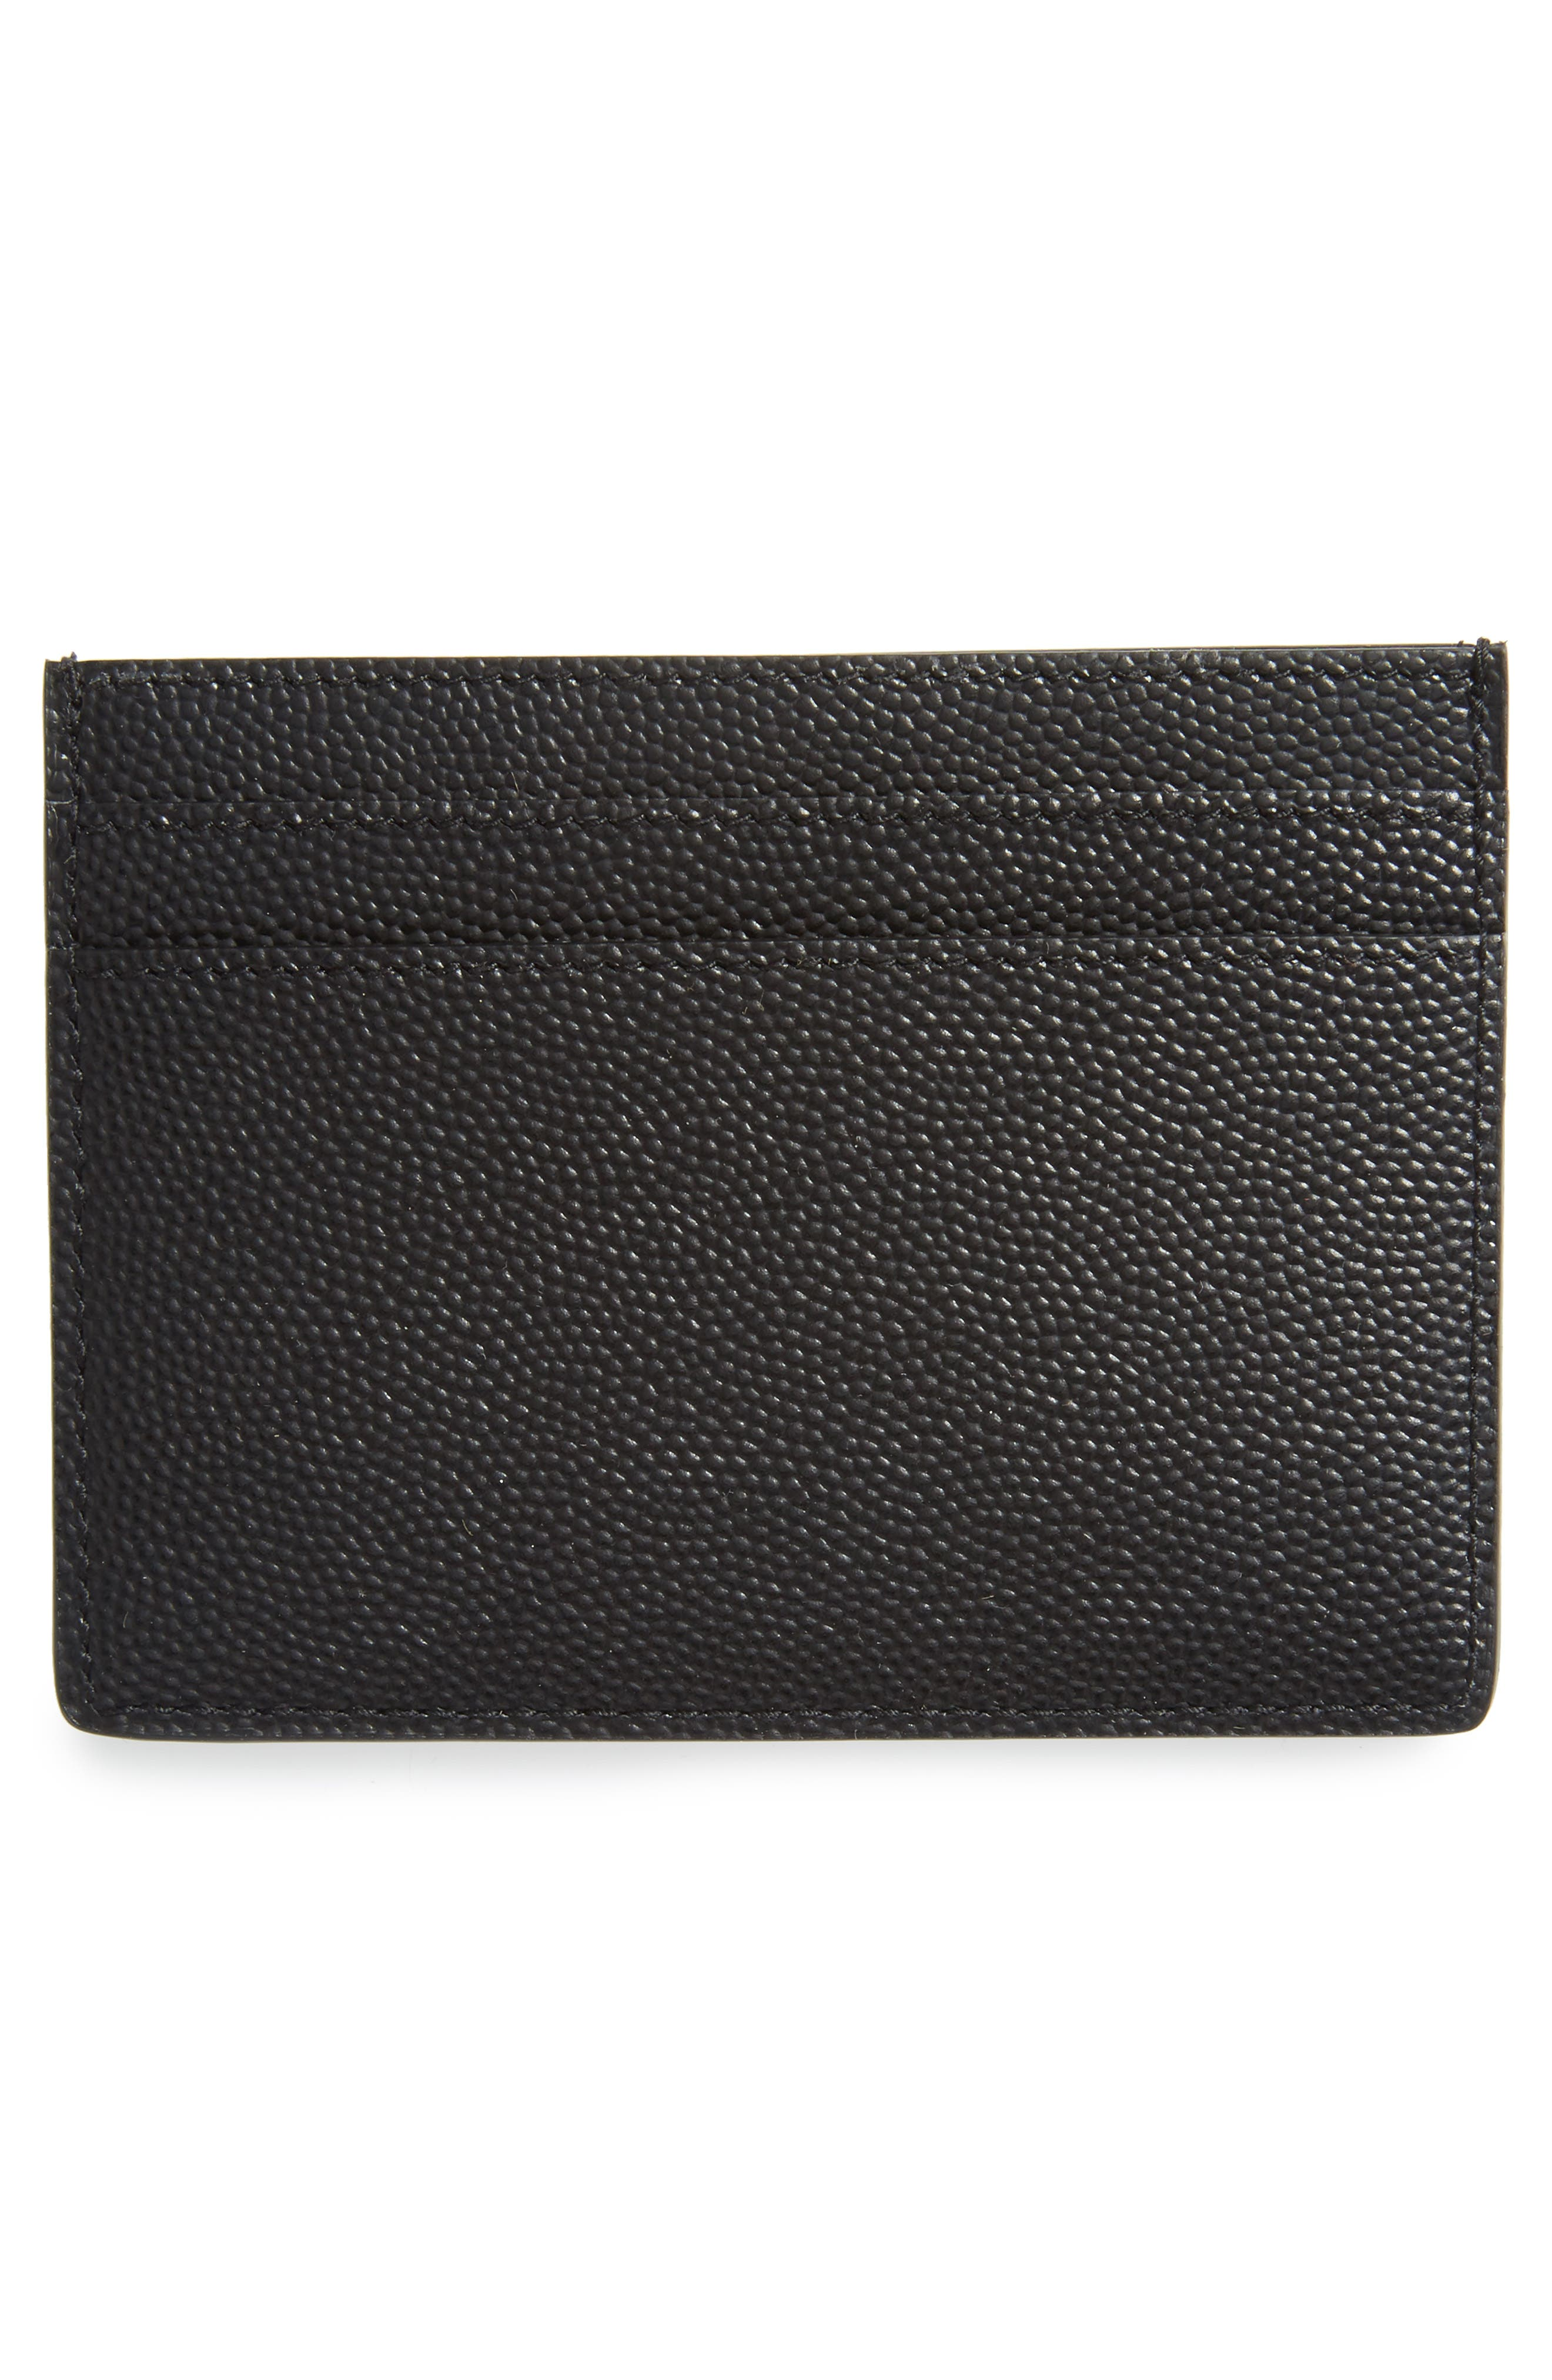 Pebble Grain Leather Card Case,                             Alternate thumbnail 2, color,                             Nero